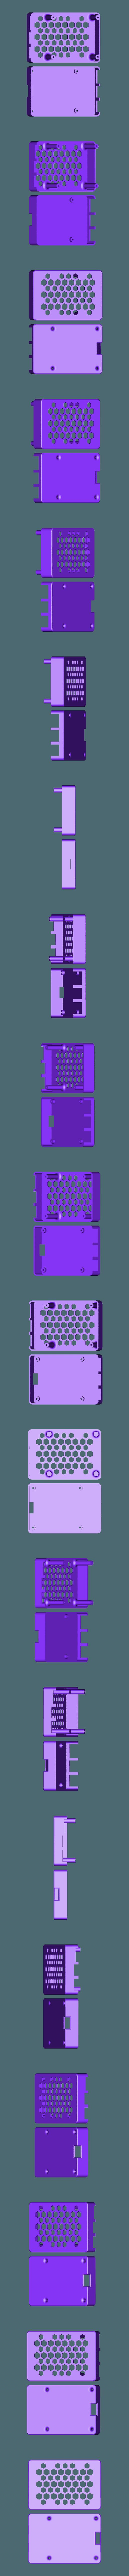 PI4_Case_Compact_Top.stl Download free STL file Pi4 Case • Design to 3D print, 3DME